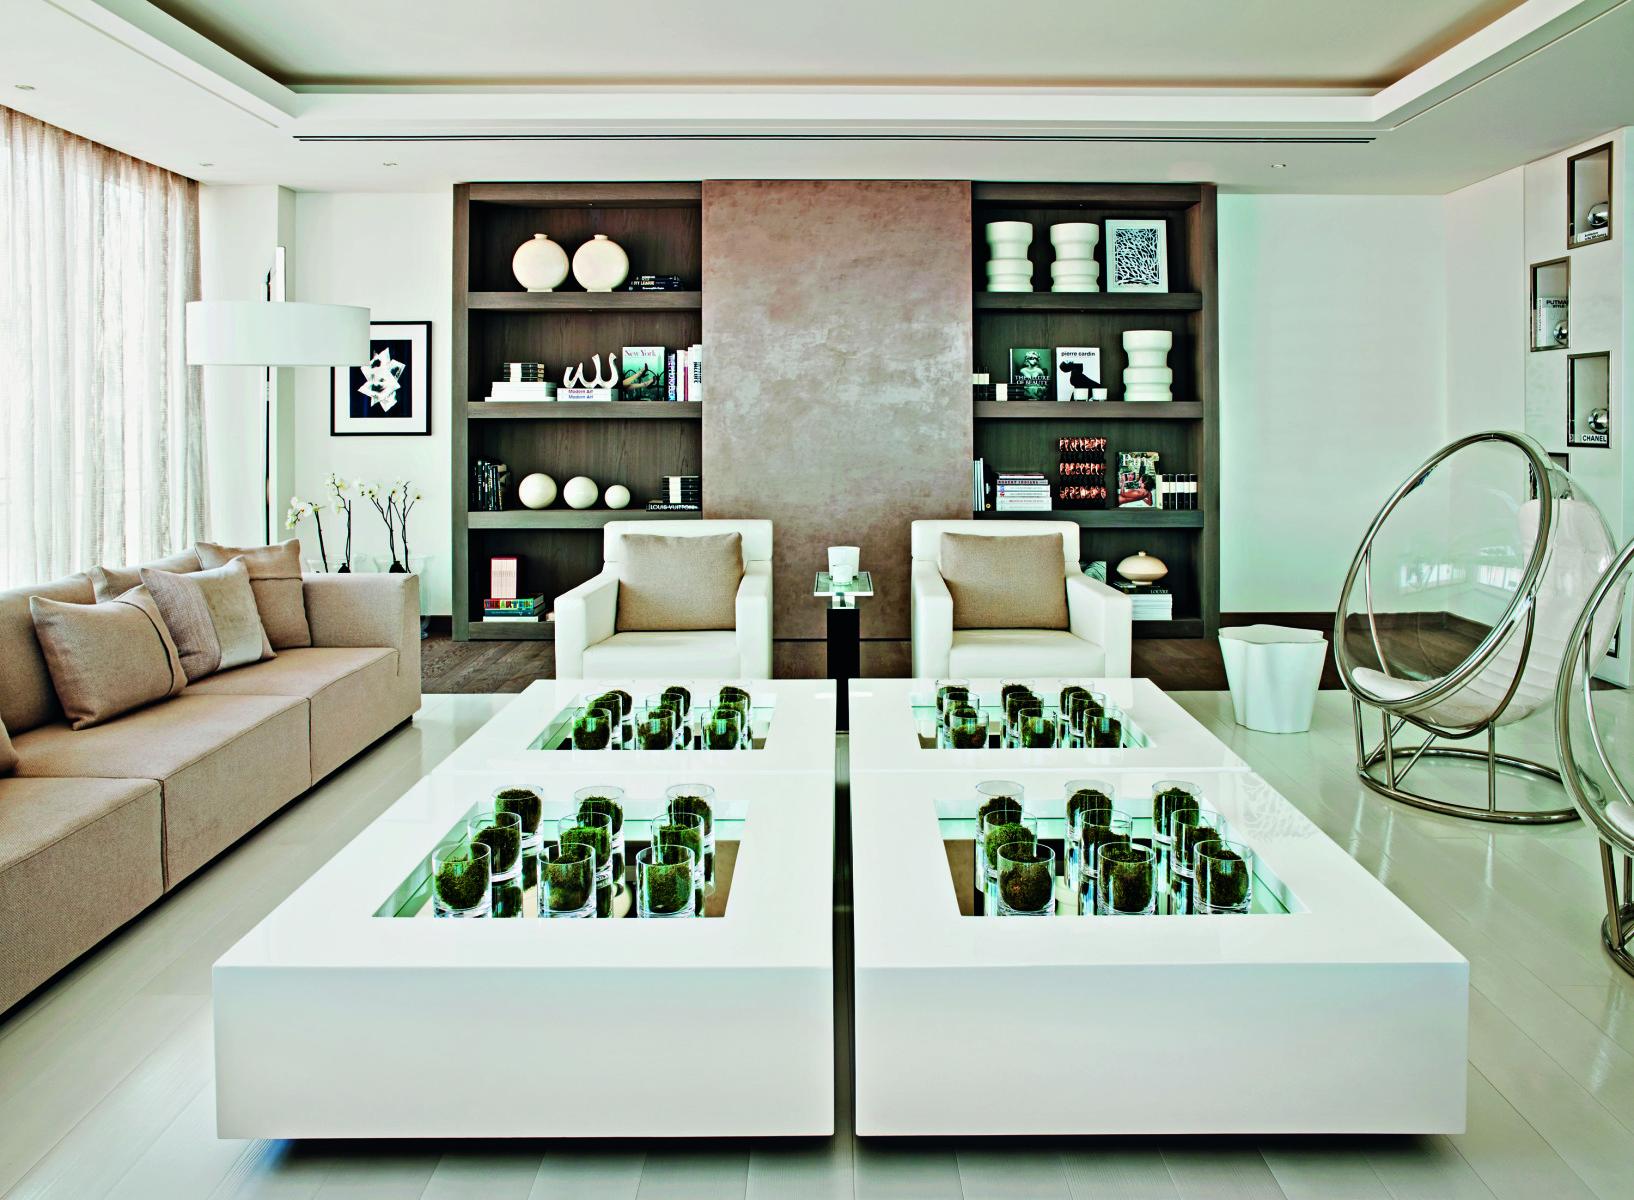 Wohndesign edel und elegant for Wohndesign 2